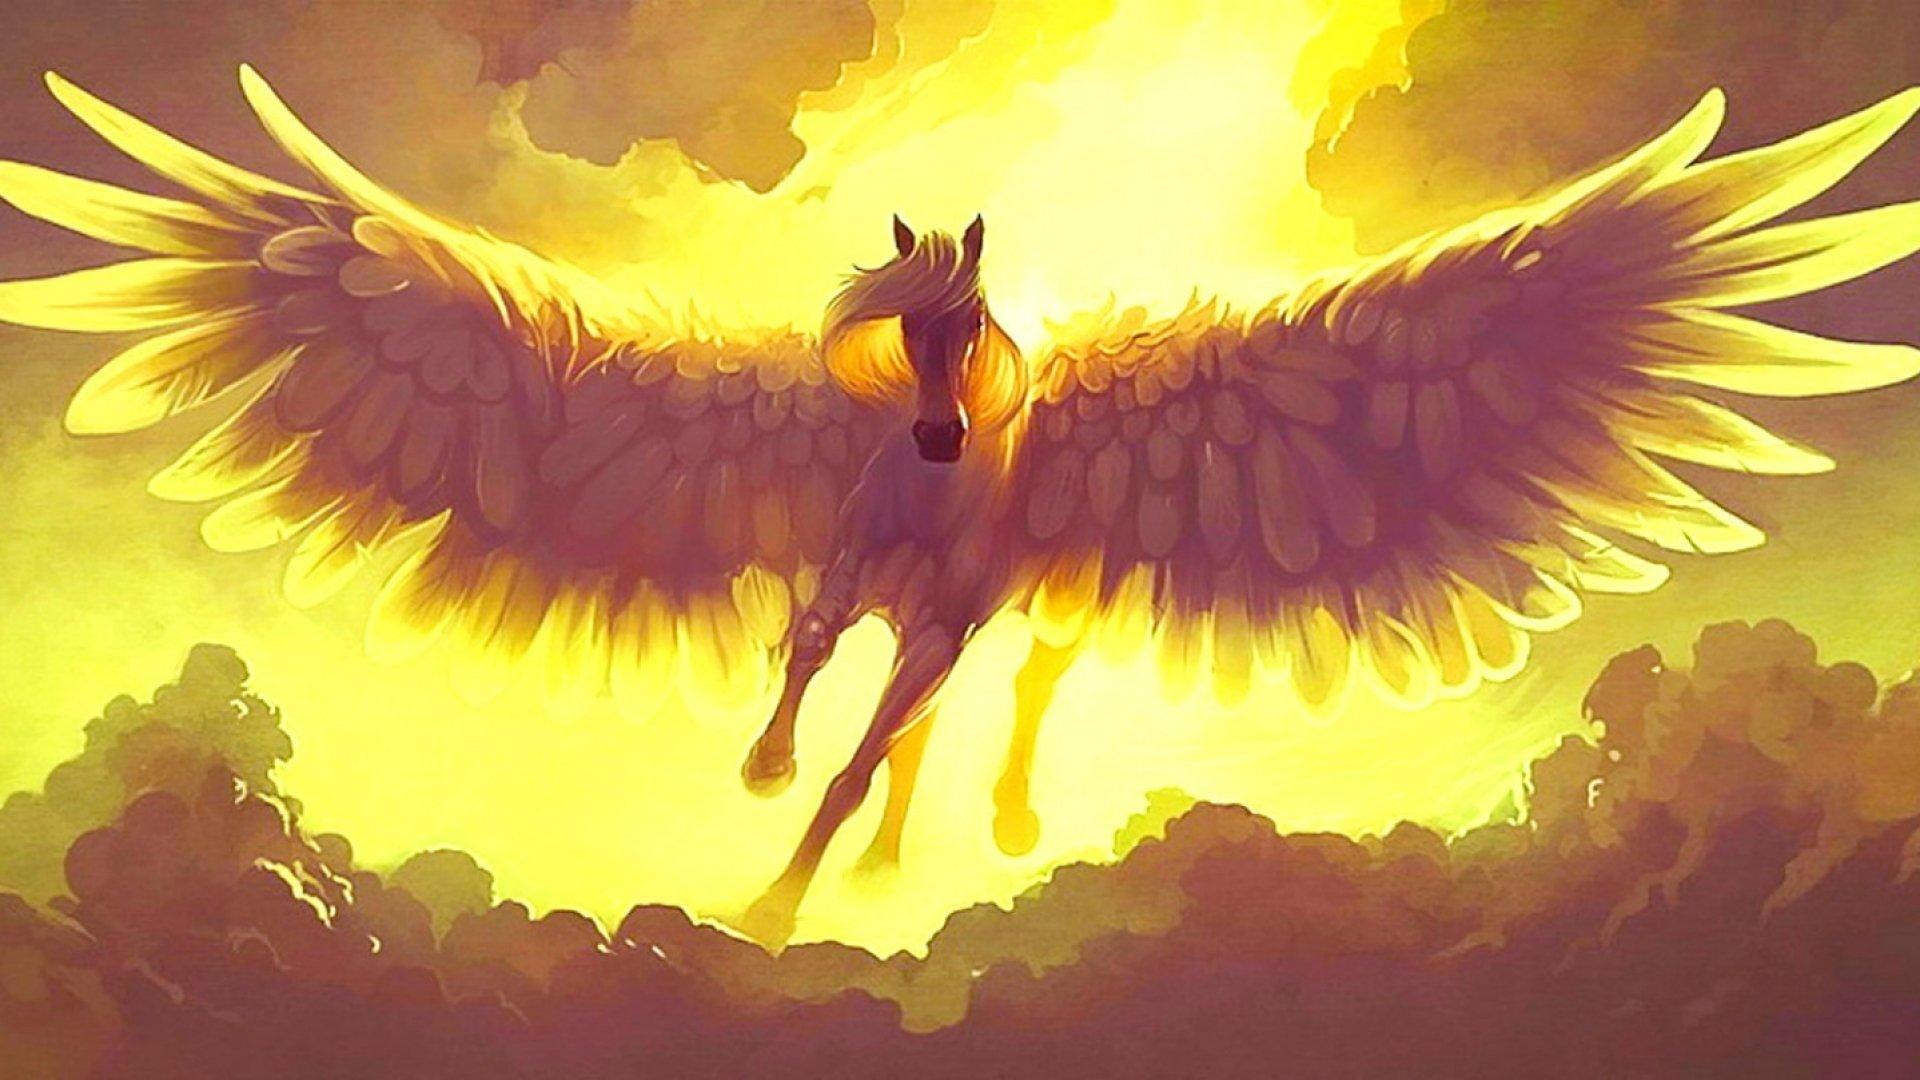 Fantasy Pegasus Horse Animal Art Artistic Artwork Wallpaper 1920x1080 667672 Wallpaperup